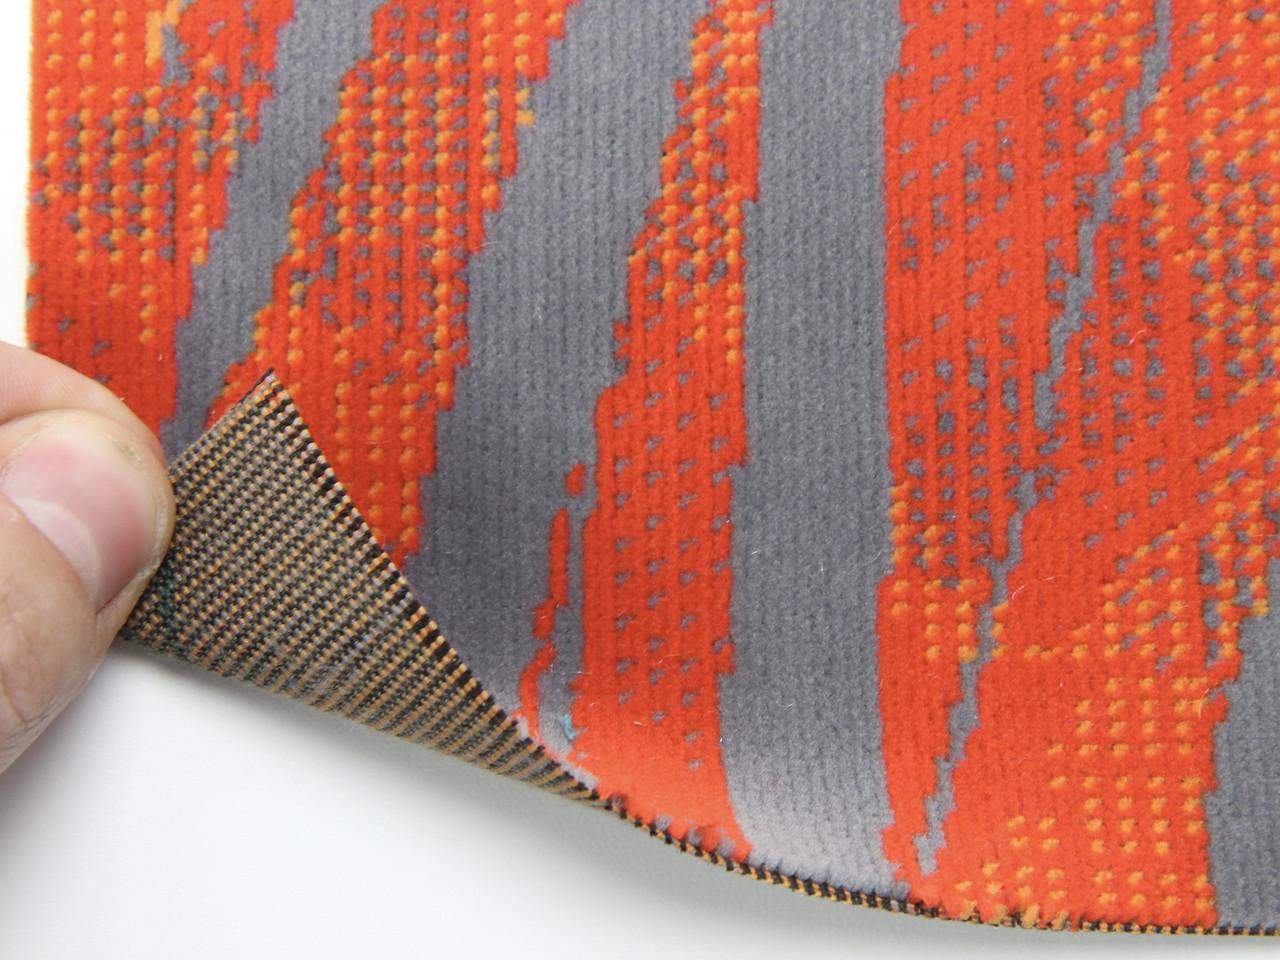 Велюровая ткань Neoplan N6-30/1 для сидений автобуса, ширина 1.40м